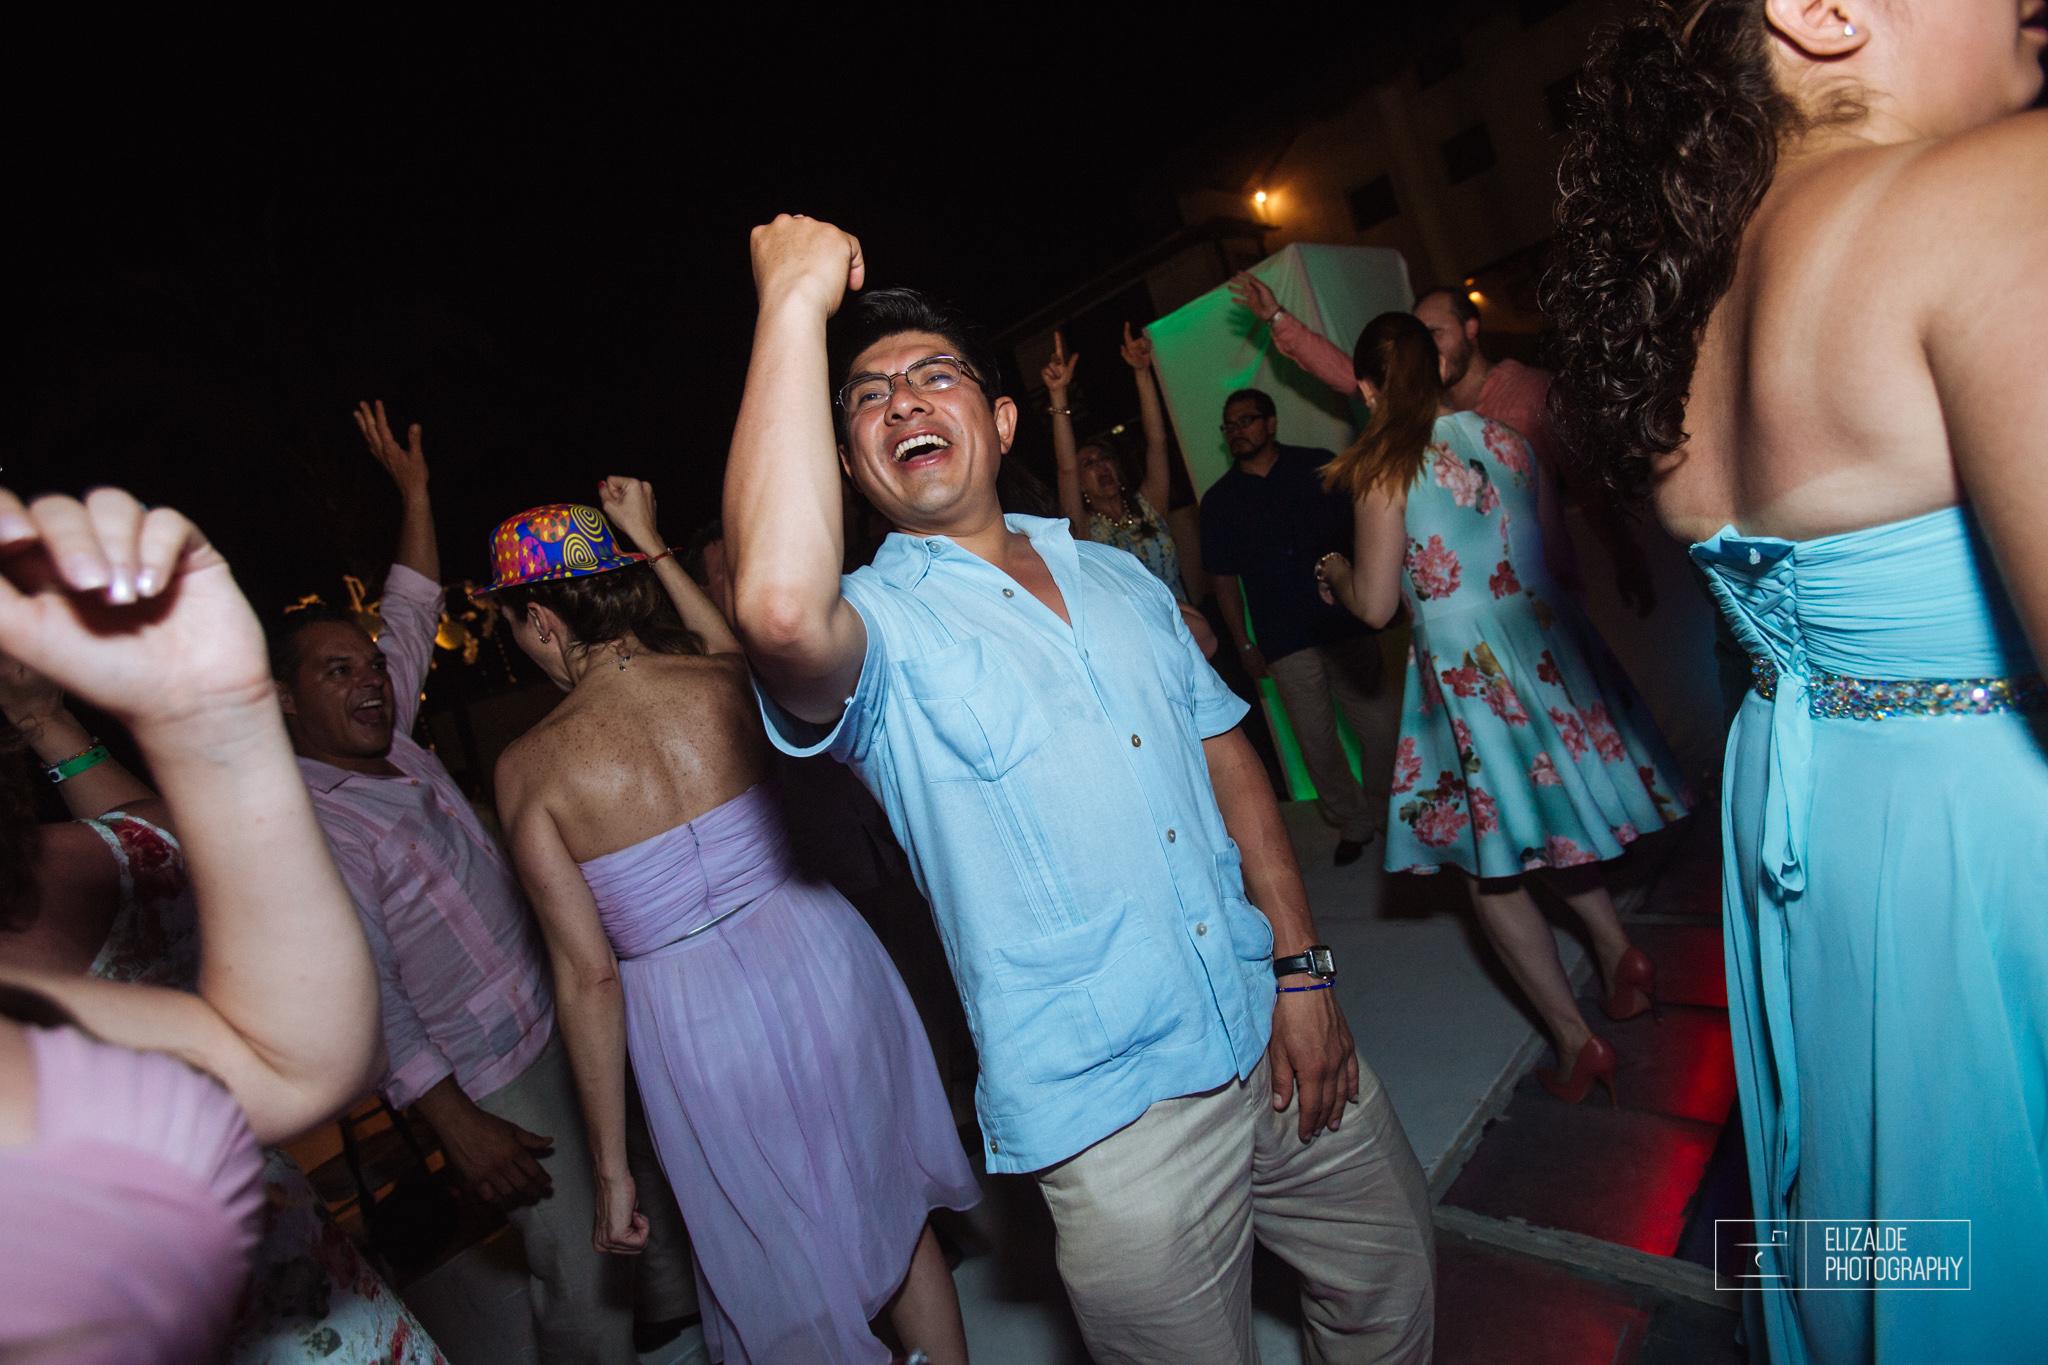 Pay and Ferran_Acapulco_Destination Wedding_Elizalde Photography-130.jpg